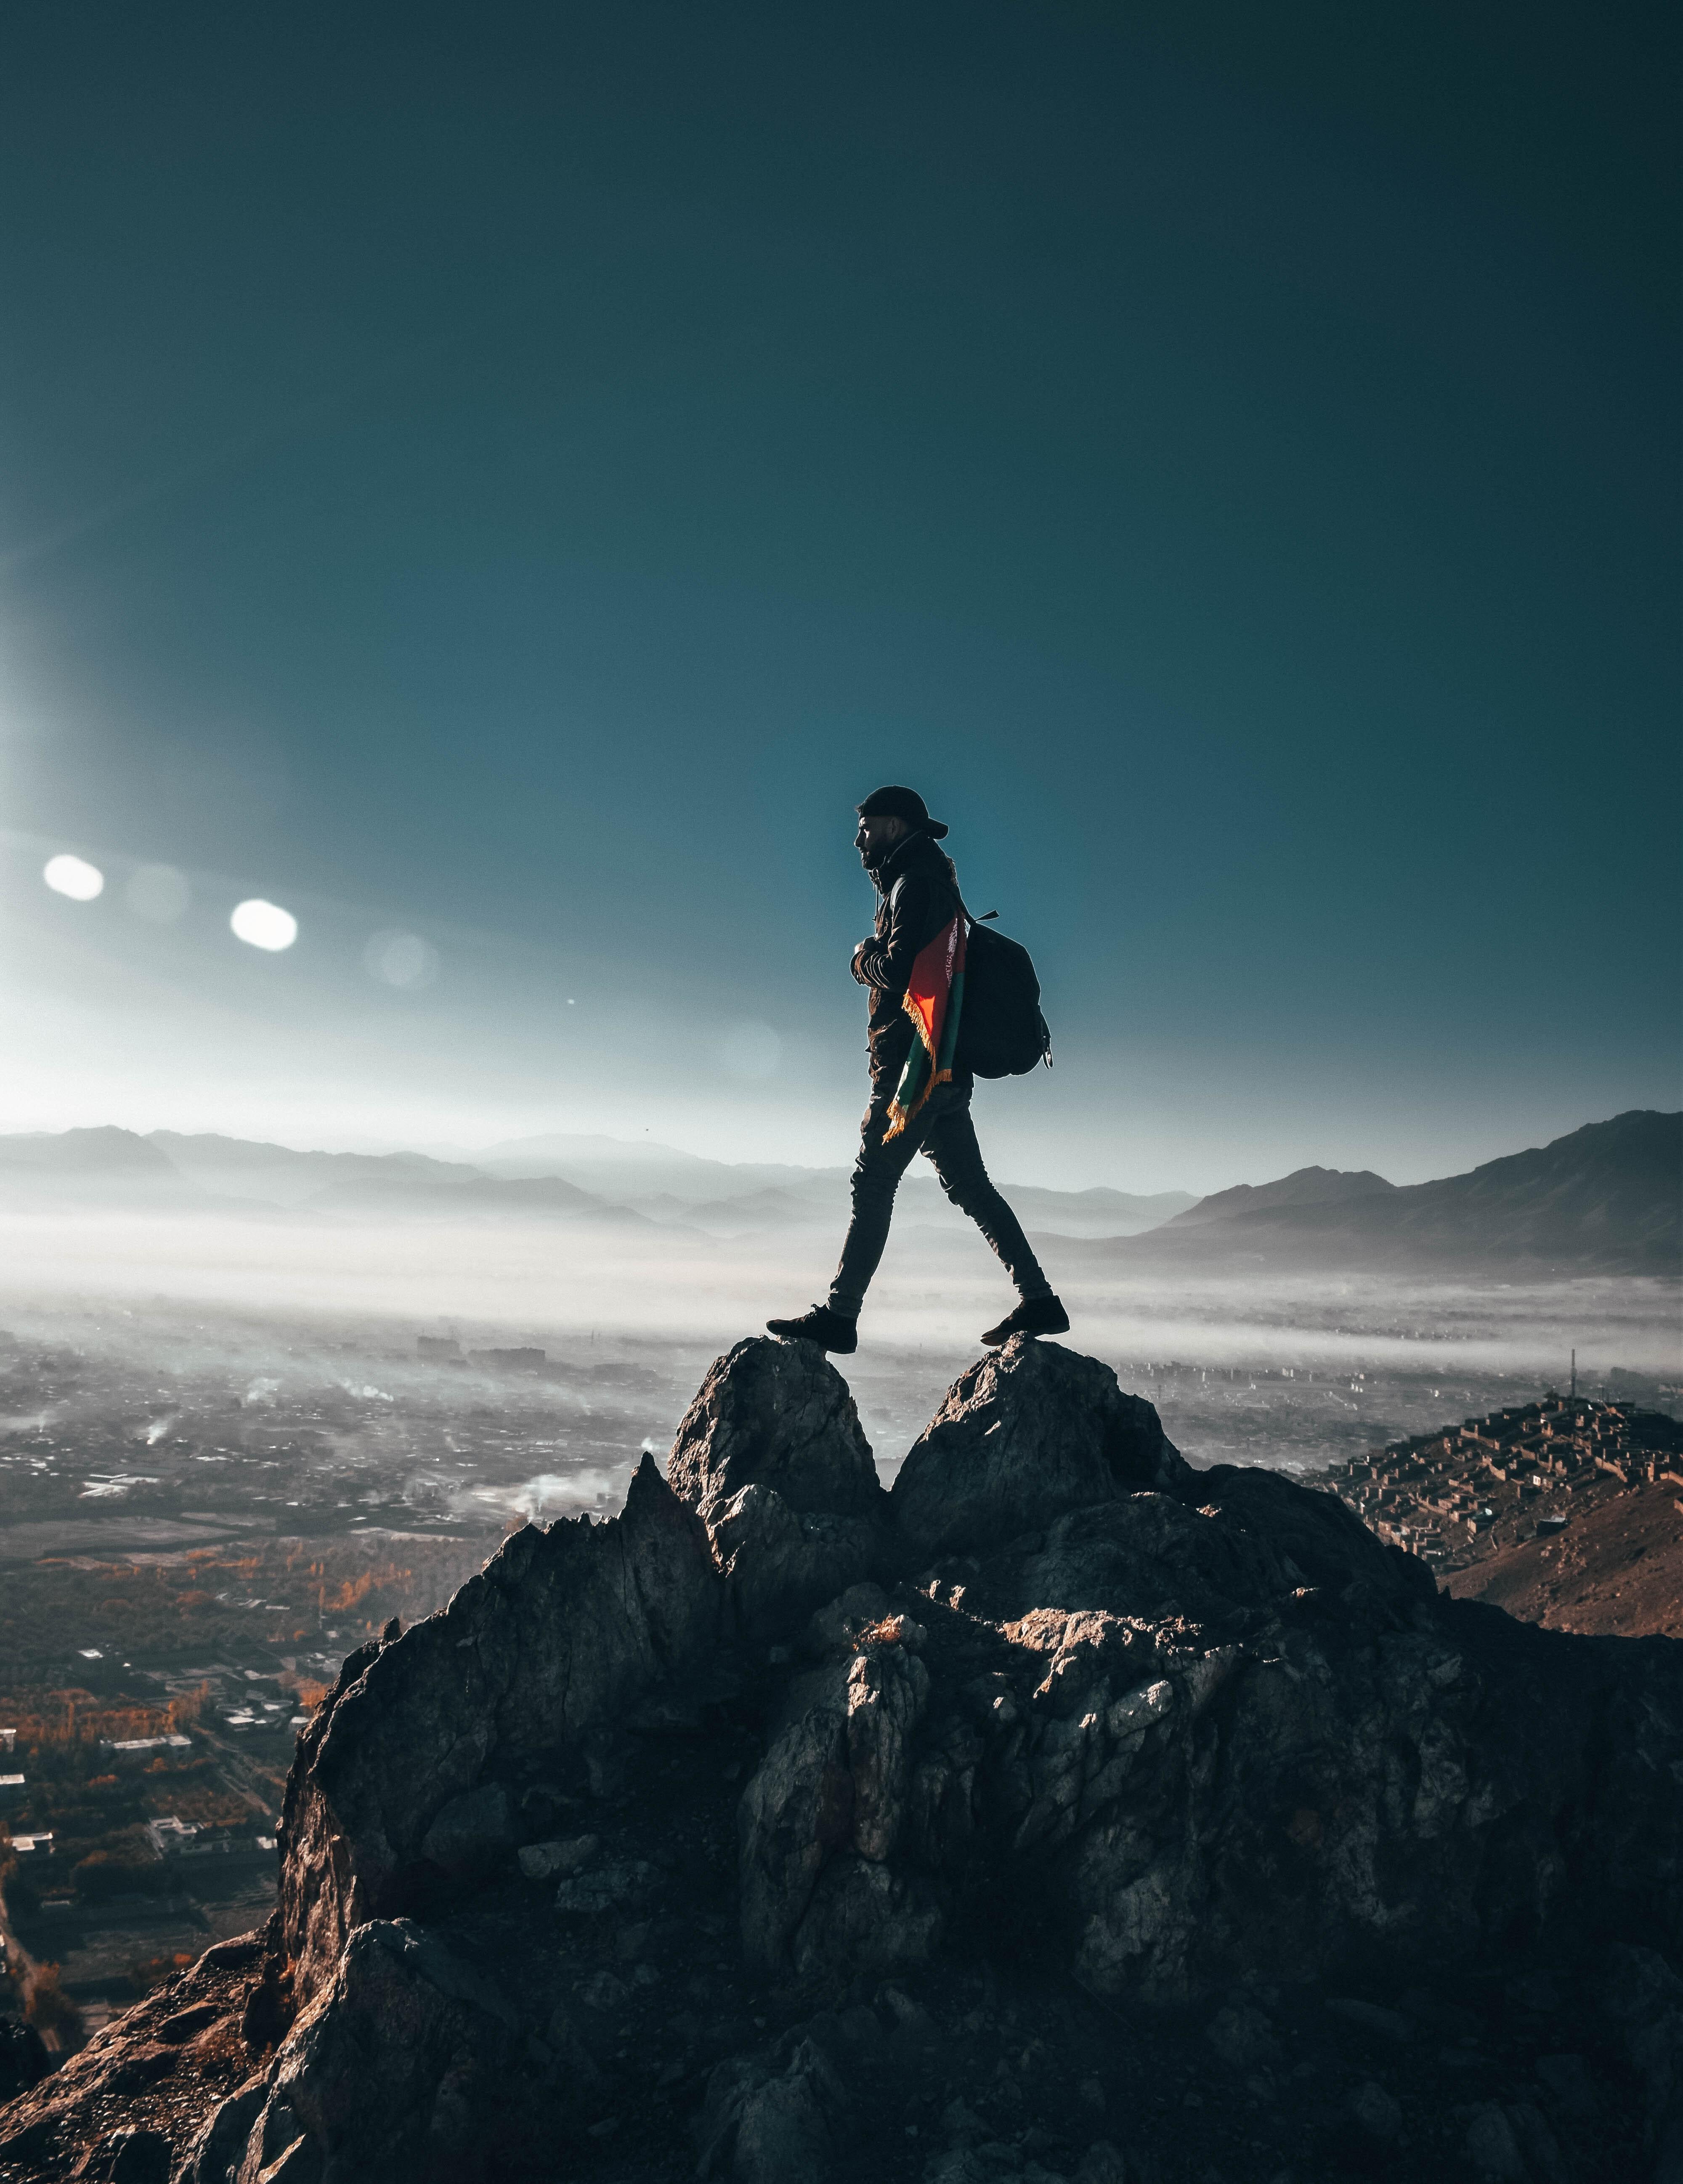 Acomplishment free images : accomplishment, adventure, backpacker, clear